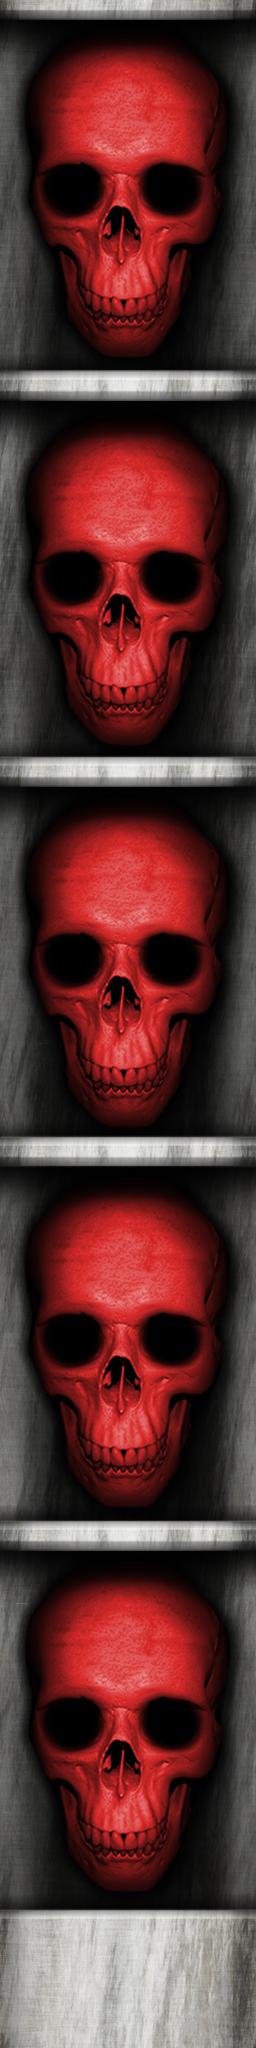 Red Skull Key Door Edge by Hoover1979